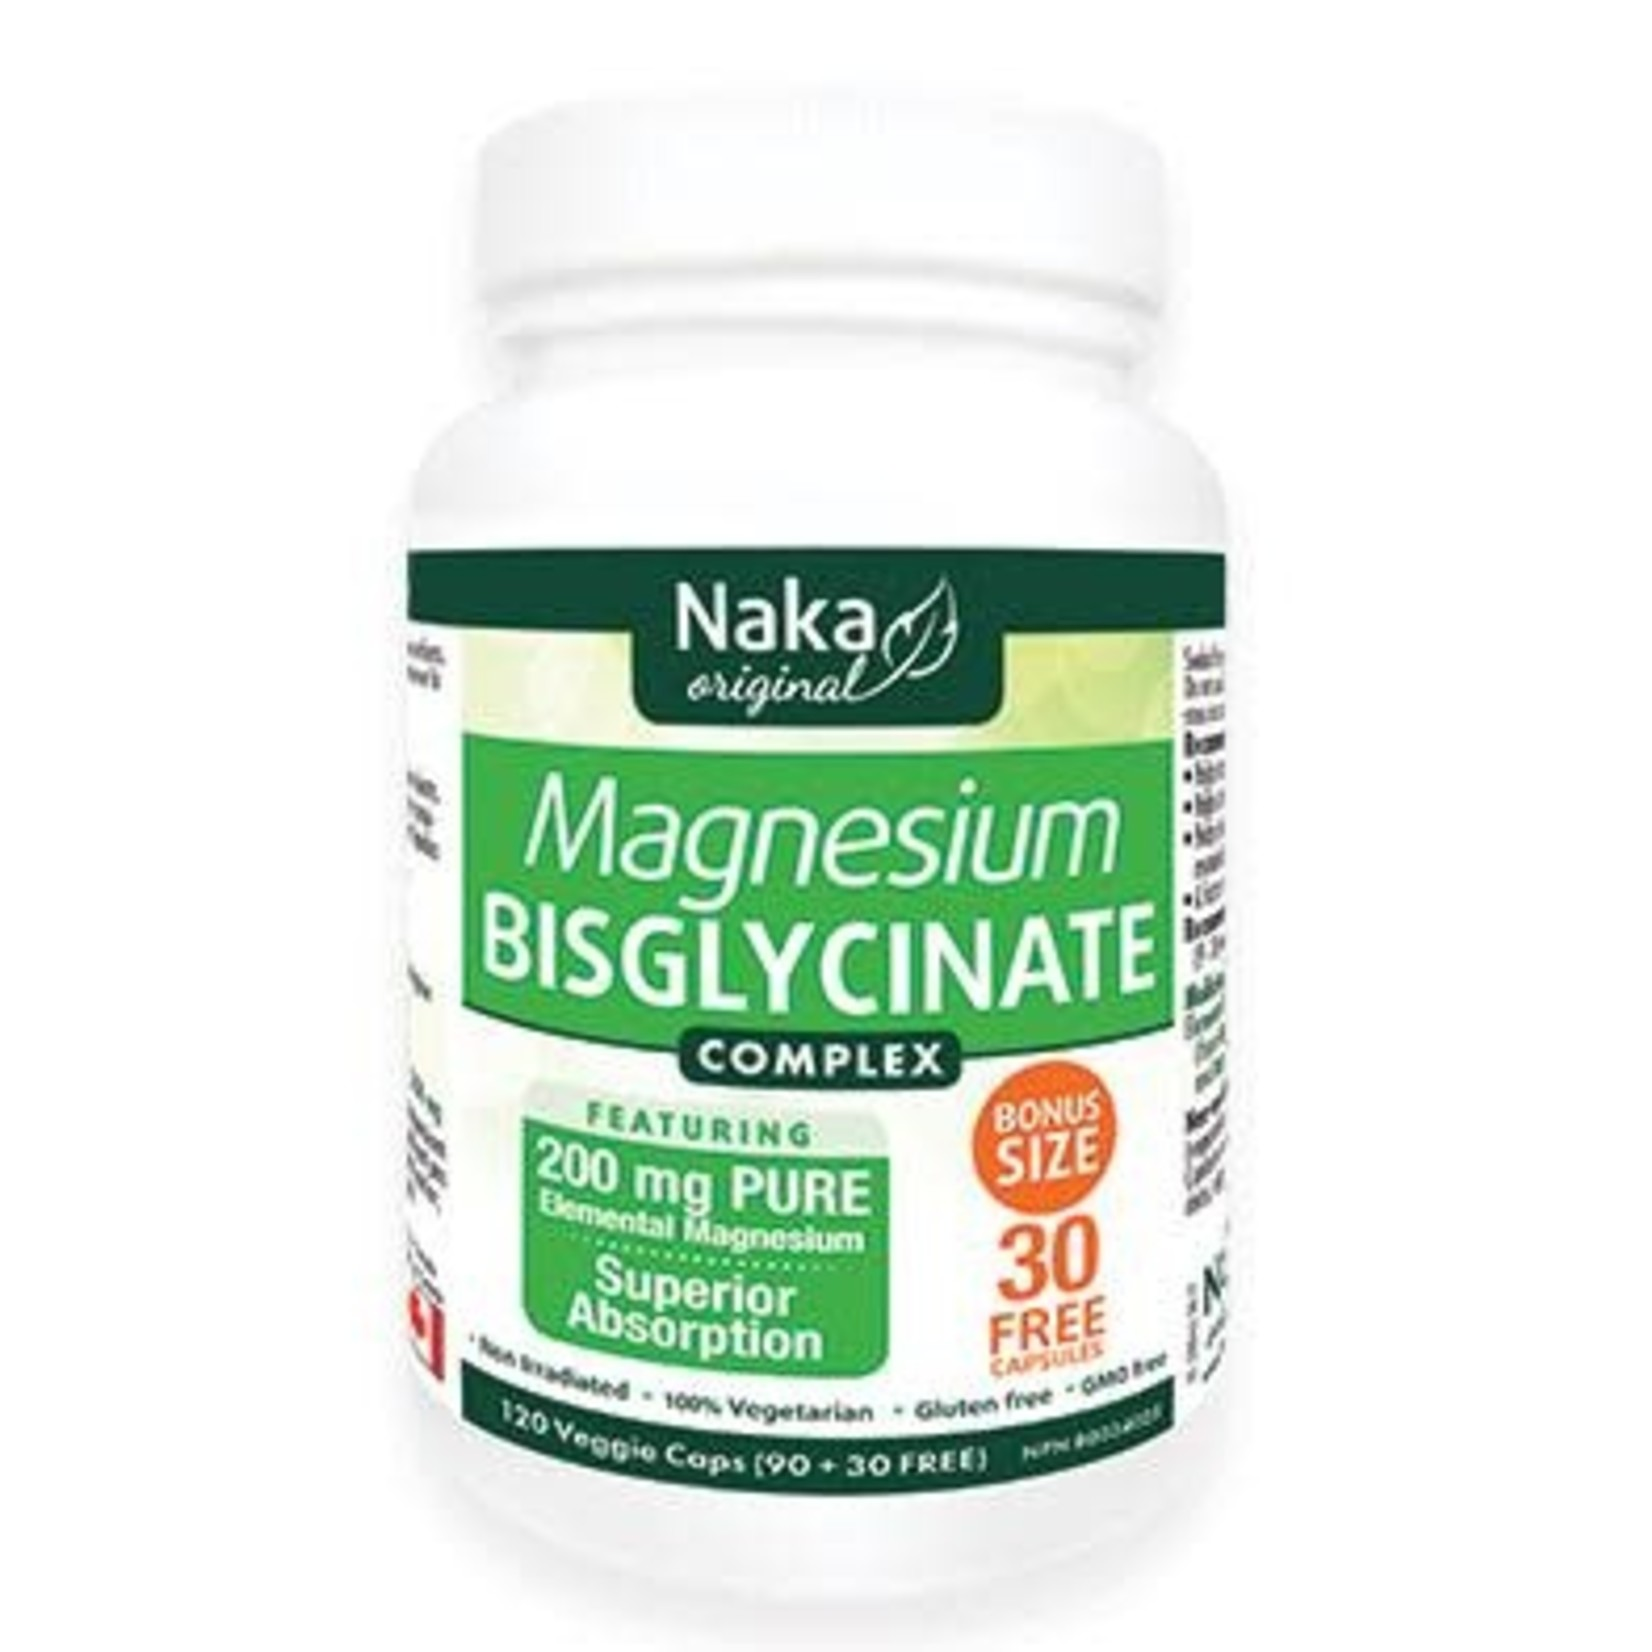 Naka Naka Magnesium Bisglycinate 120 caps